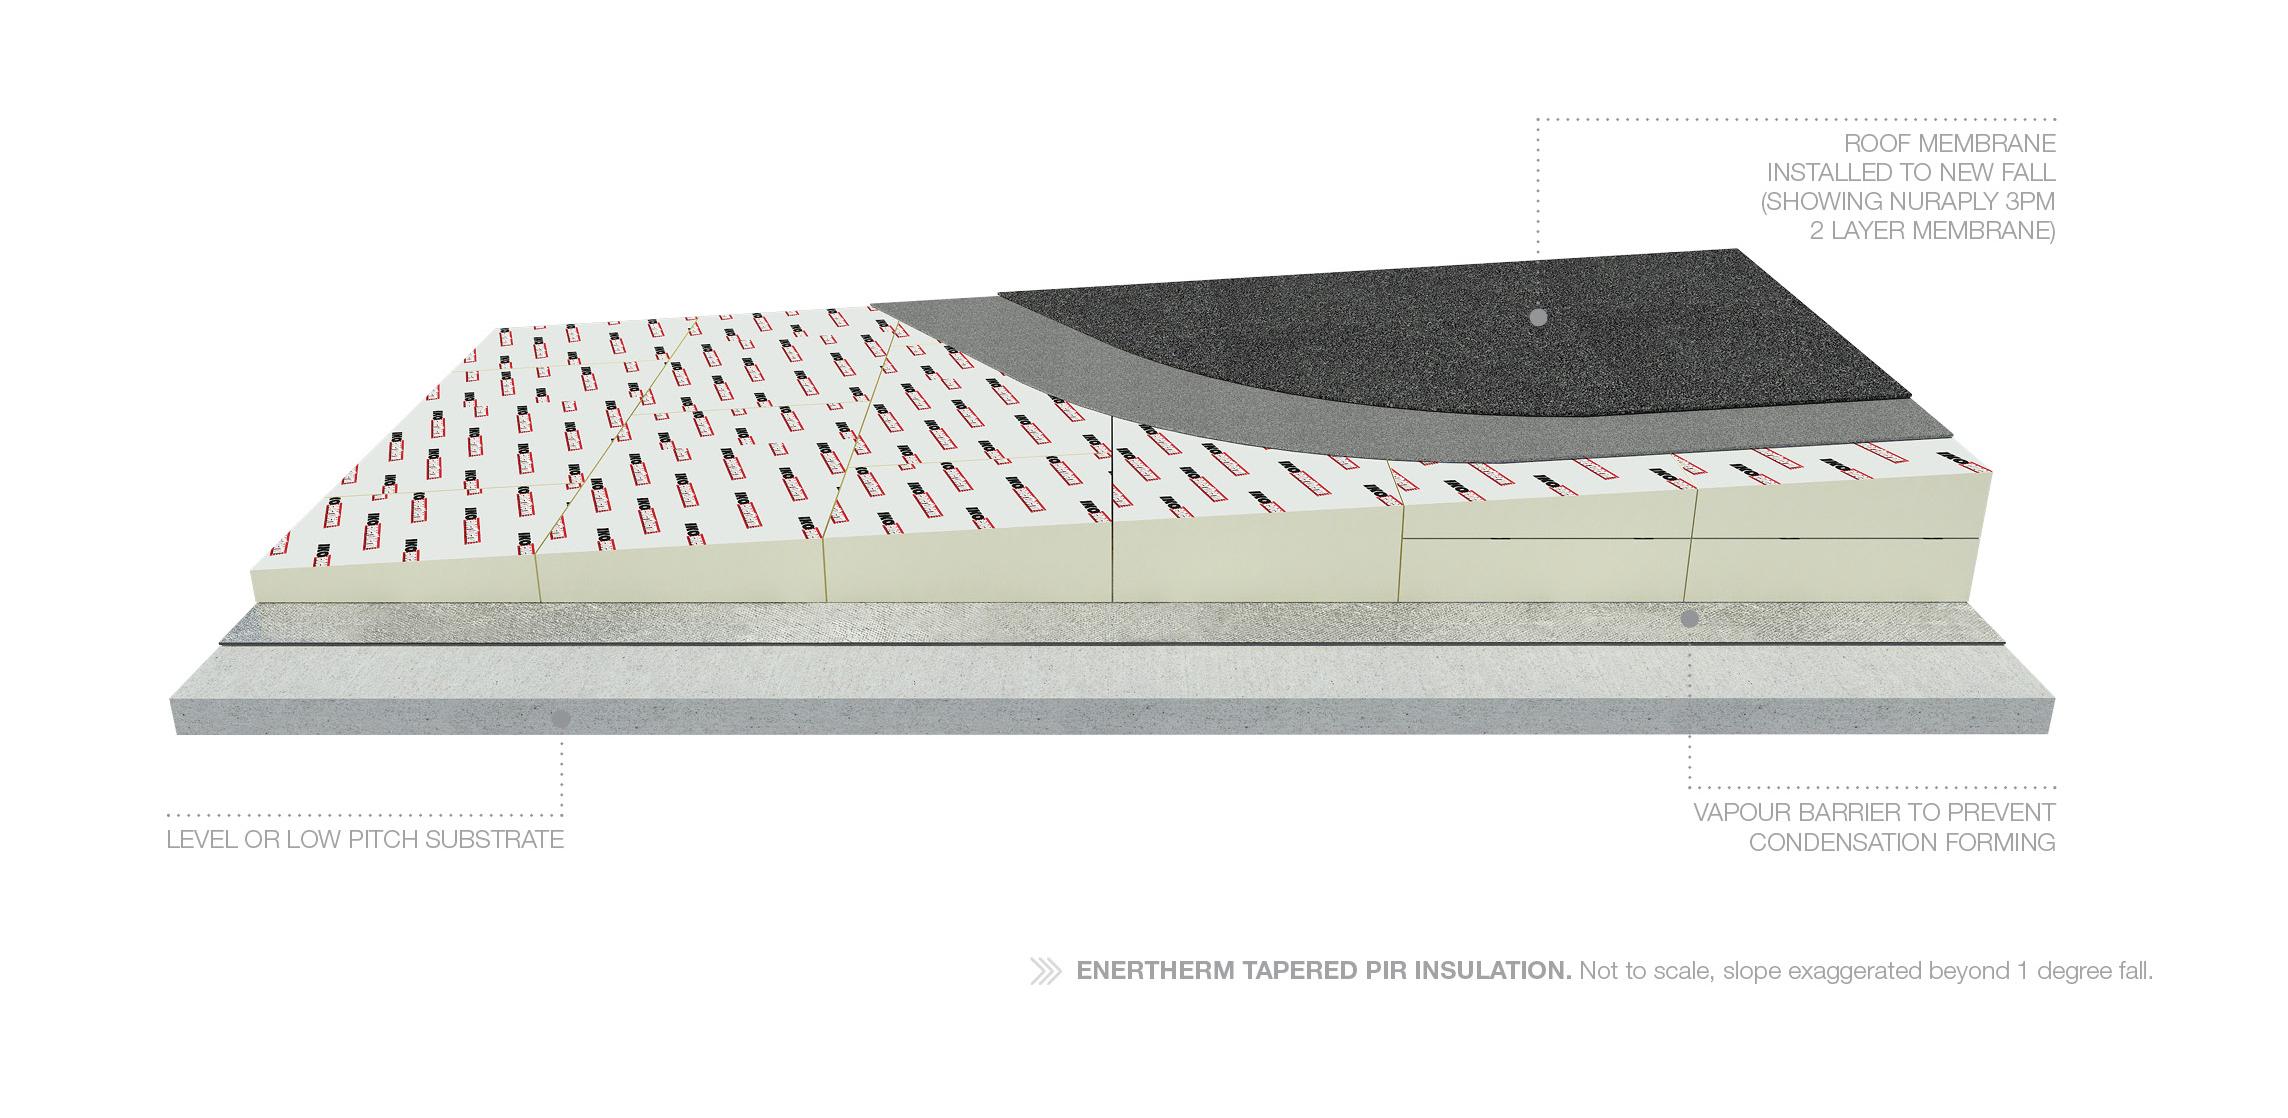 Warm Roof Pir Insulation Waterproof Membrane